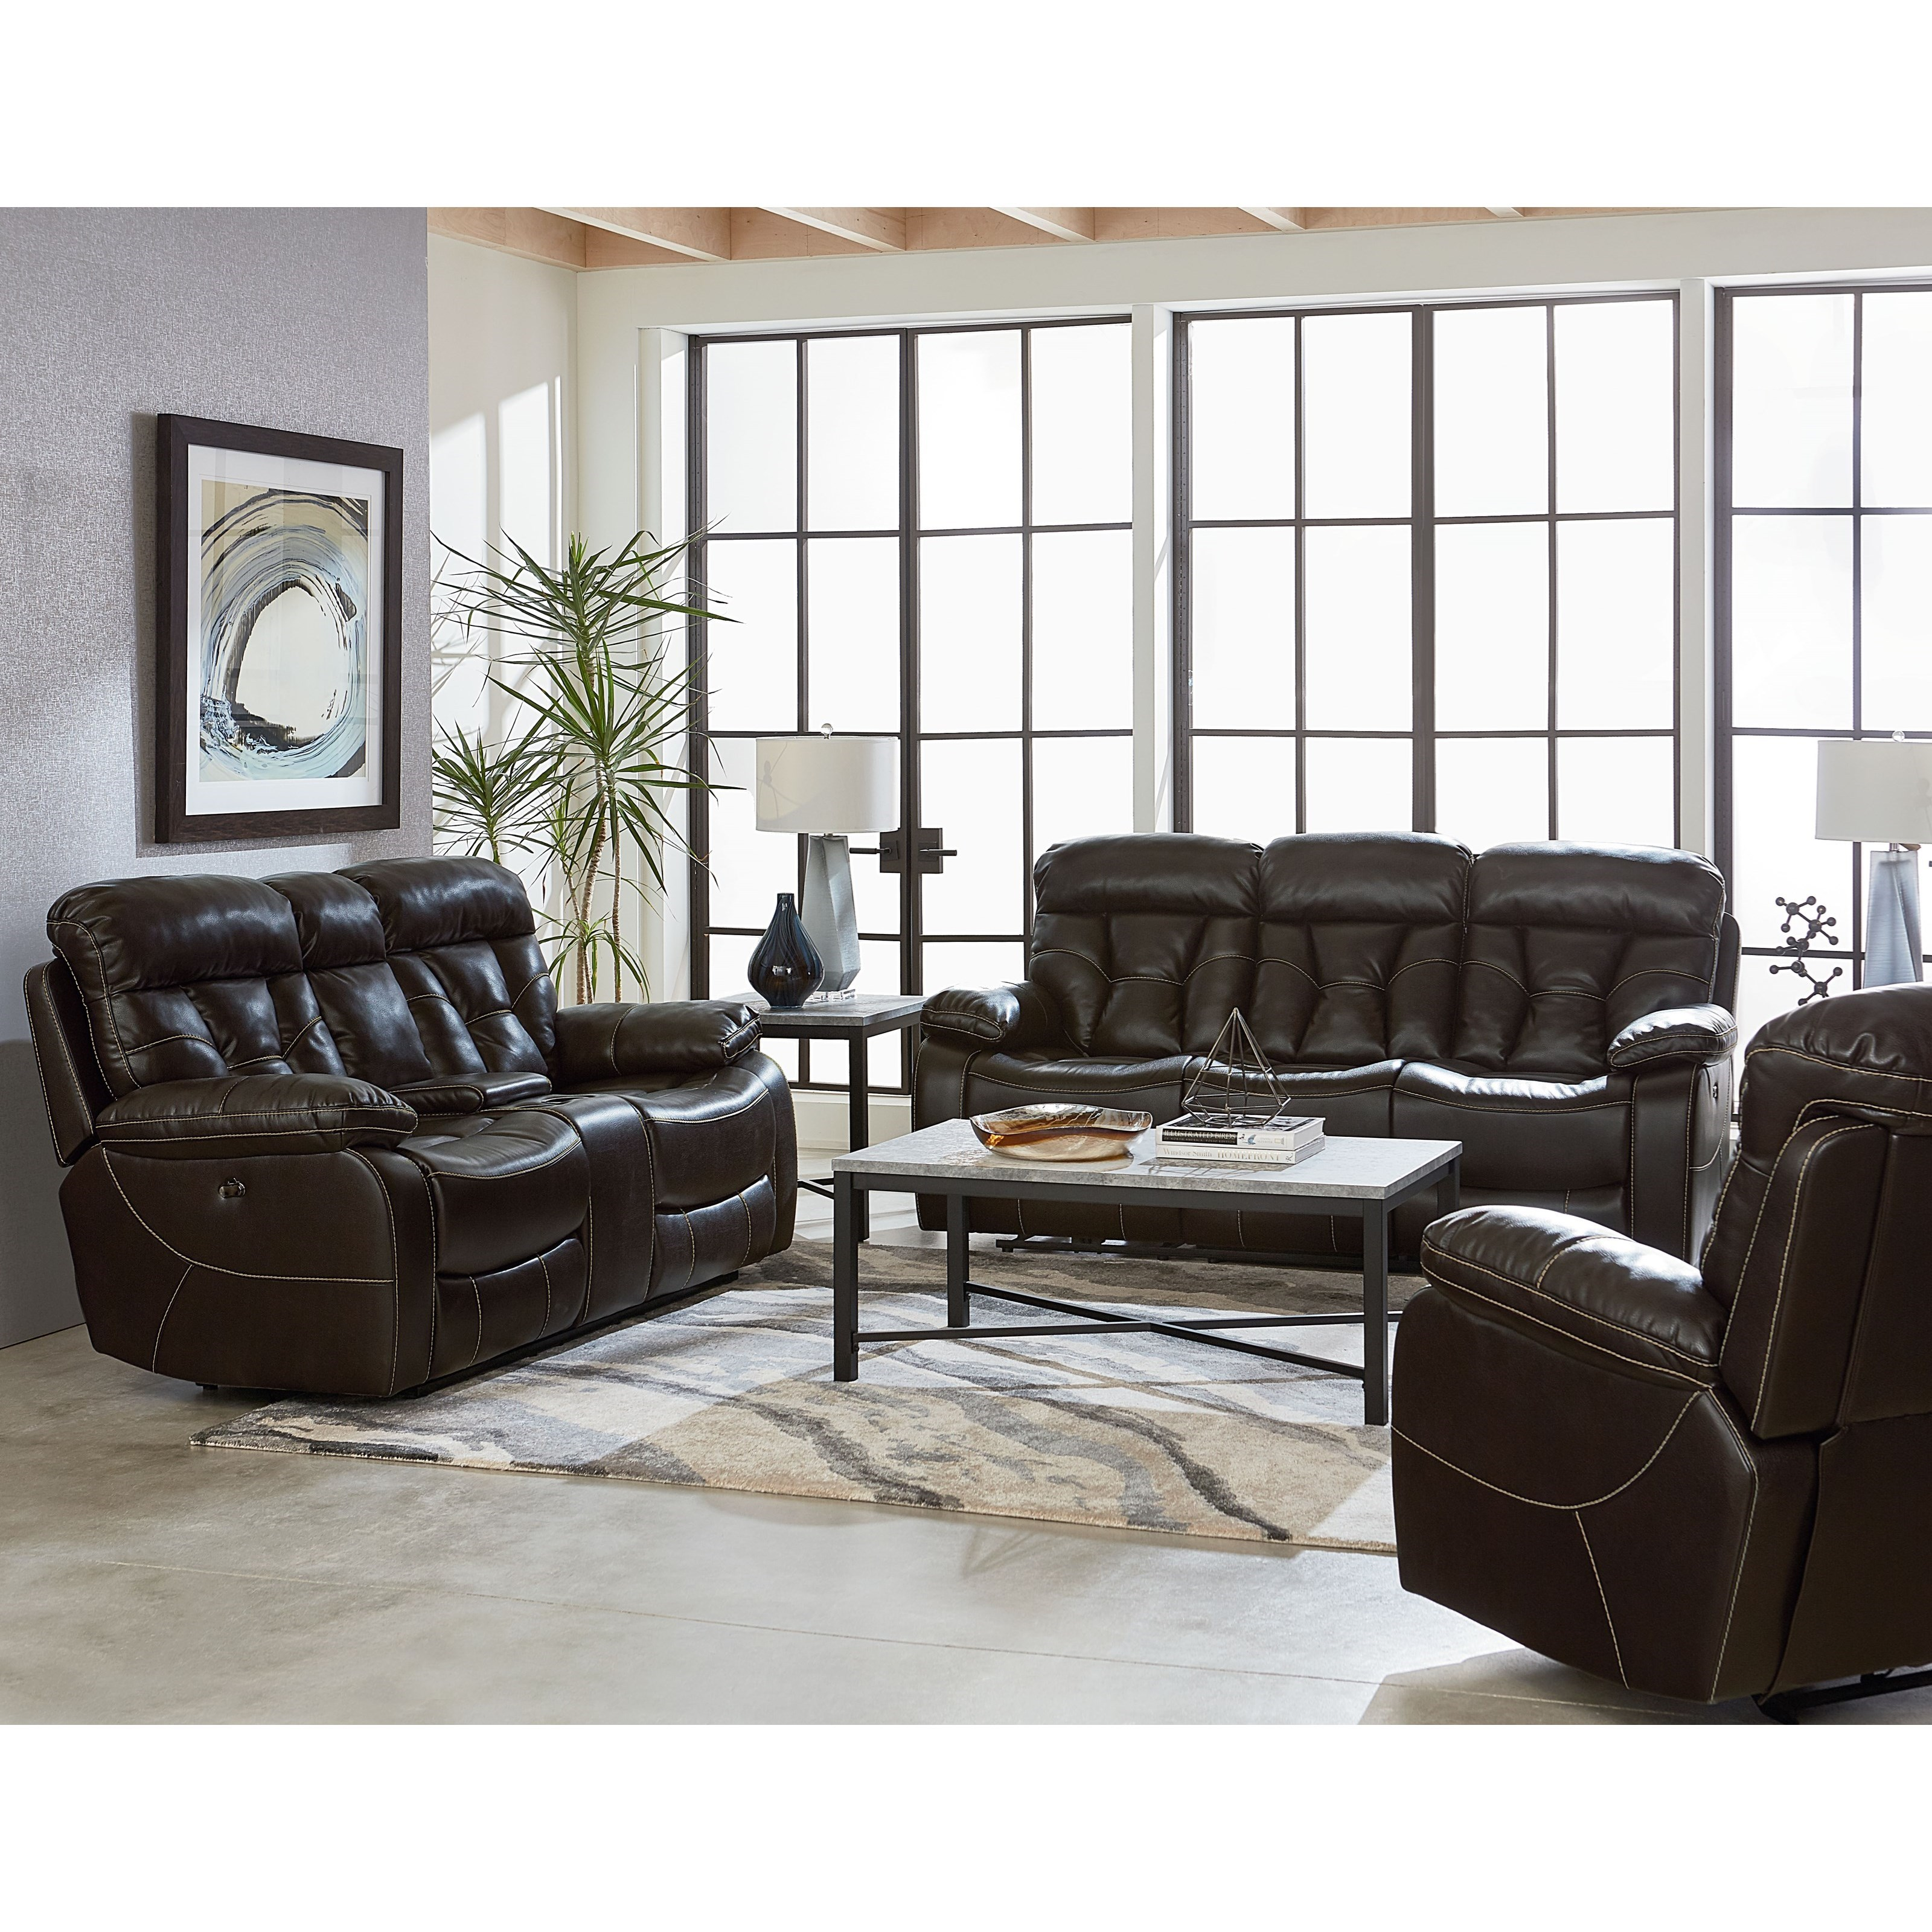 Standard Furniture Peoria Reclining Sofa With Pillow Arms